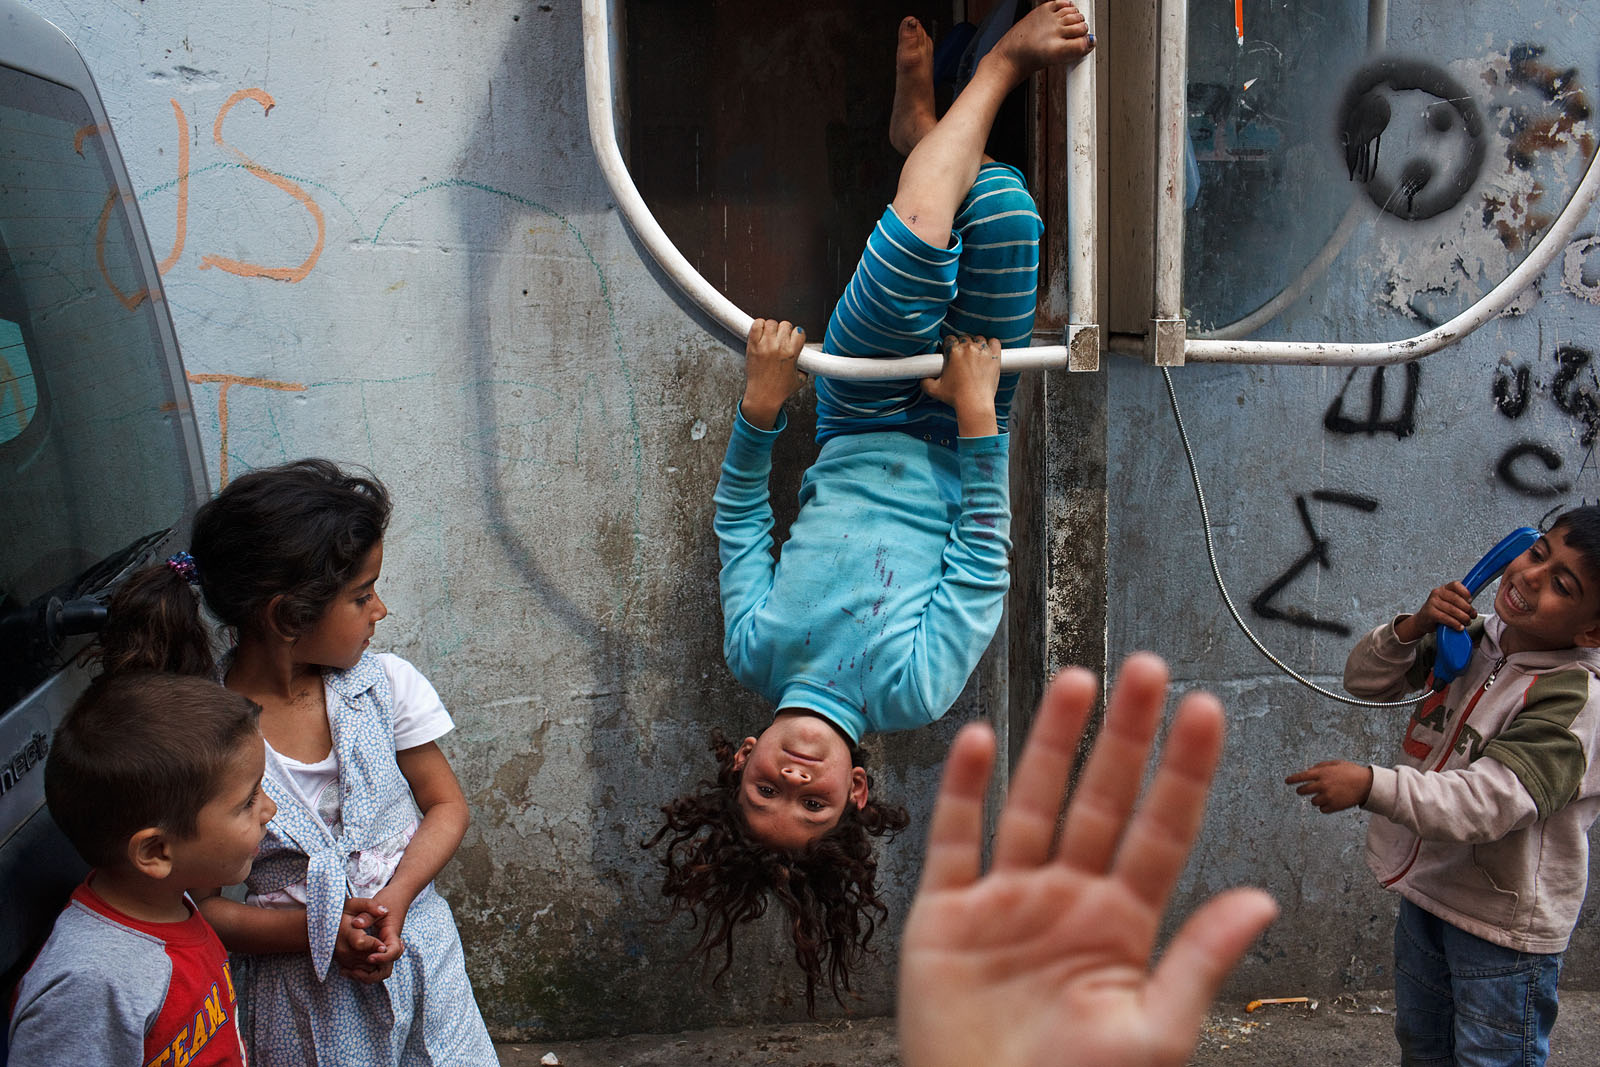 Children play in Unkapani area in Istanbul, Turkey.